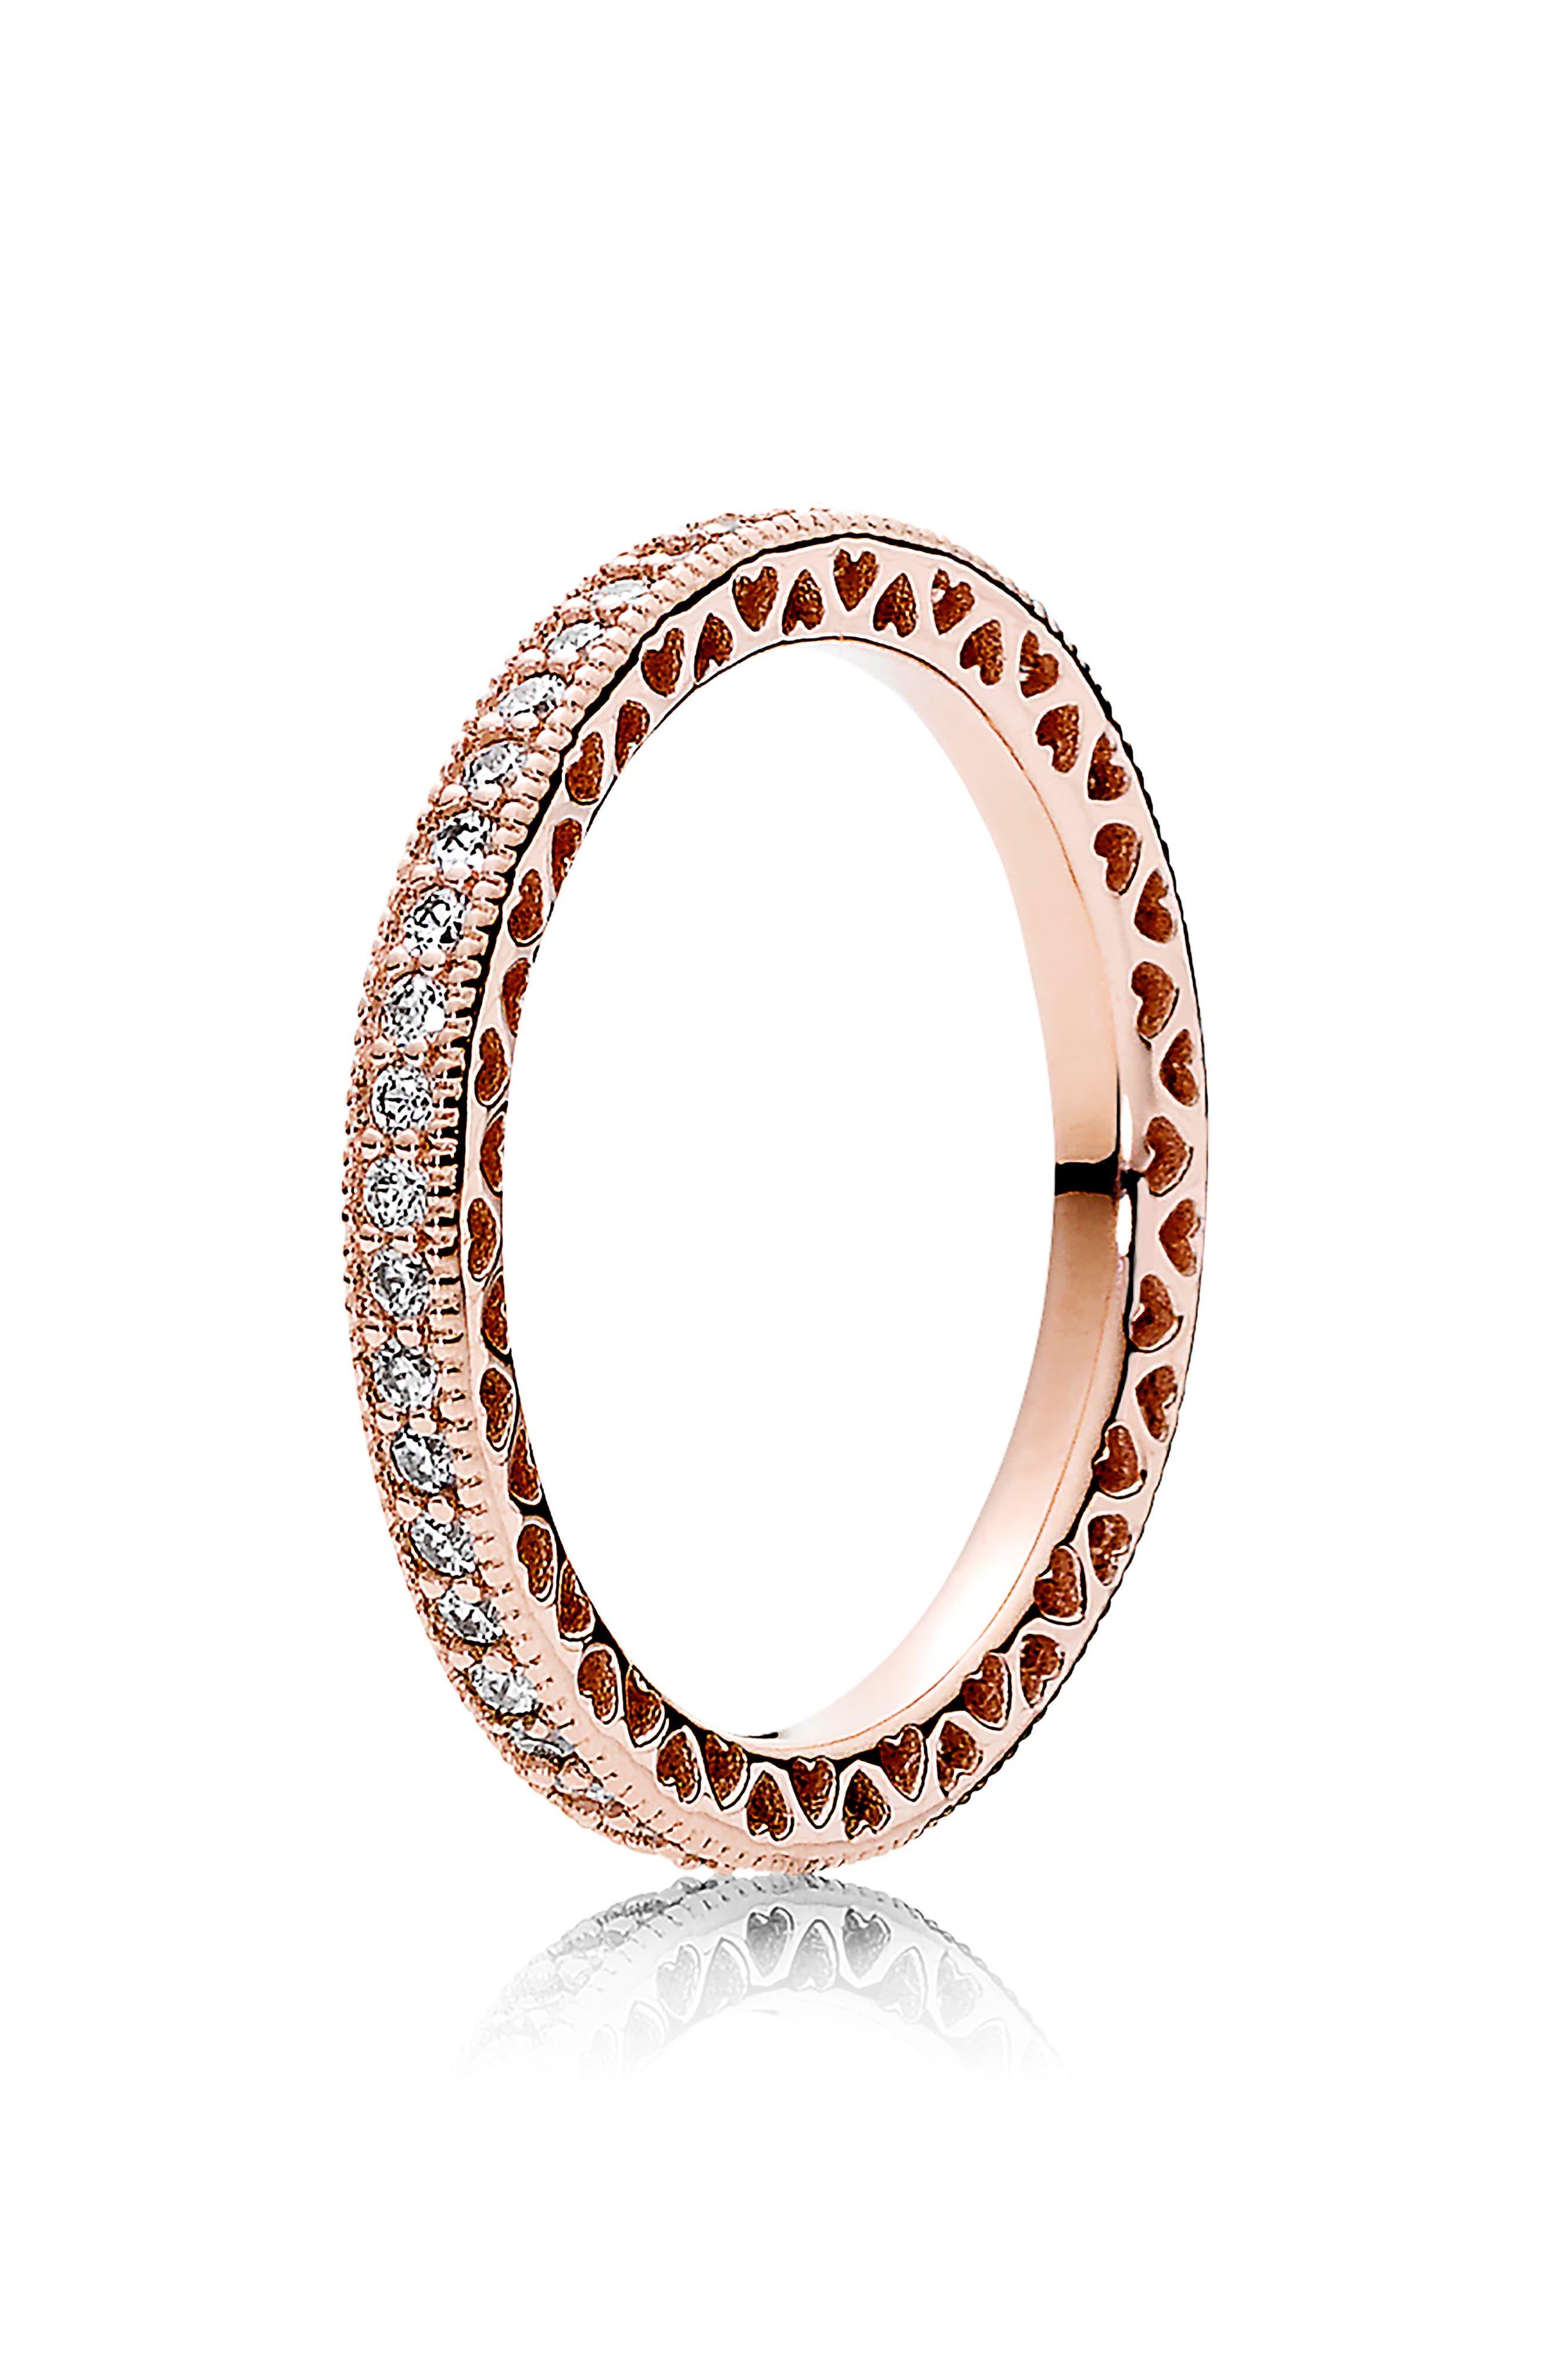 Hearts of Pandora Eternity Stacking Ring,                             Main thumbnail 1, color,                             ROSE GOLD